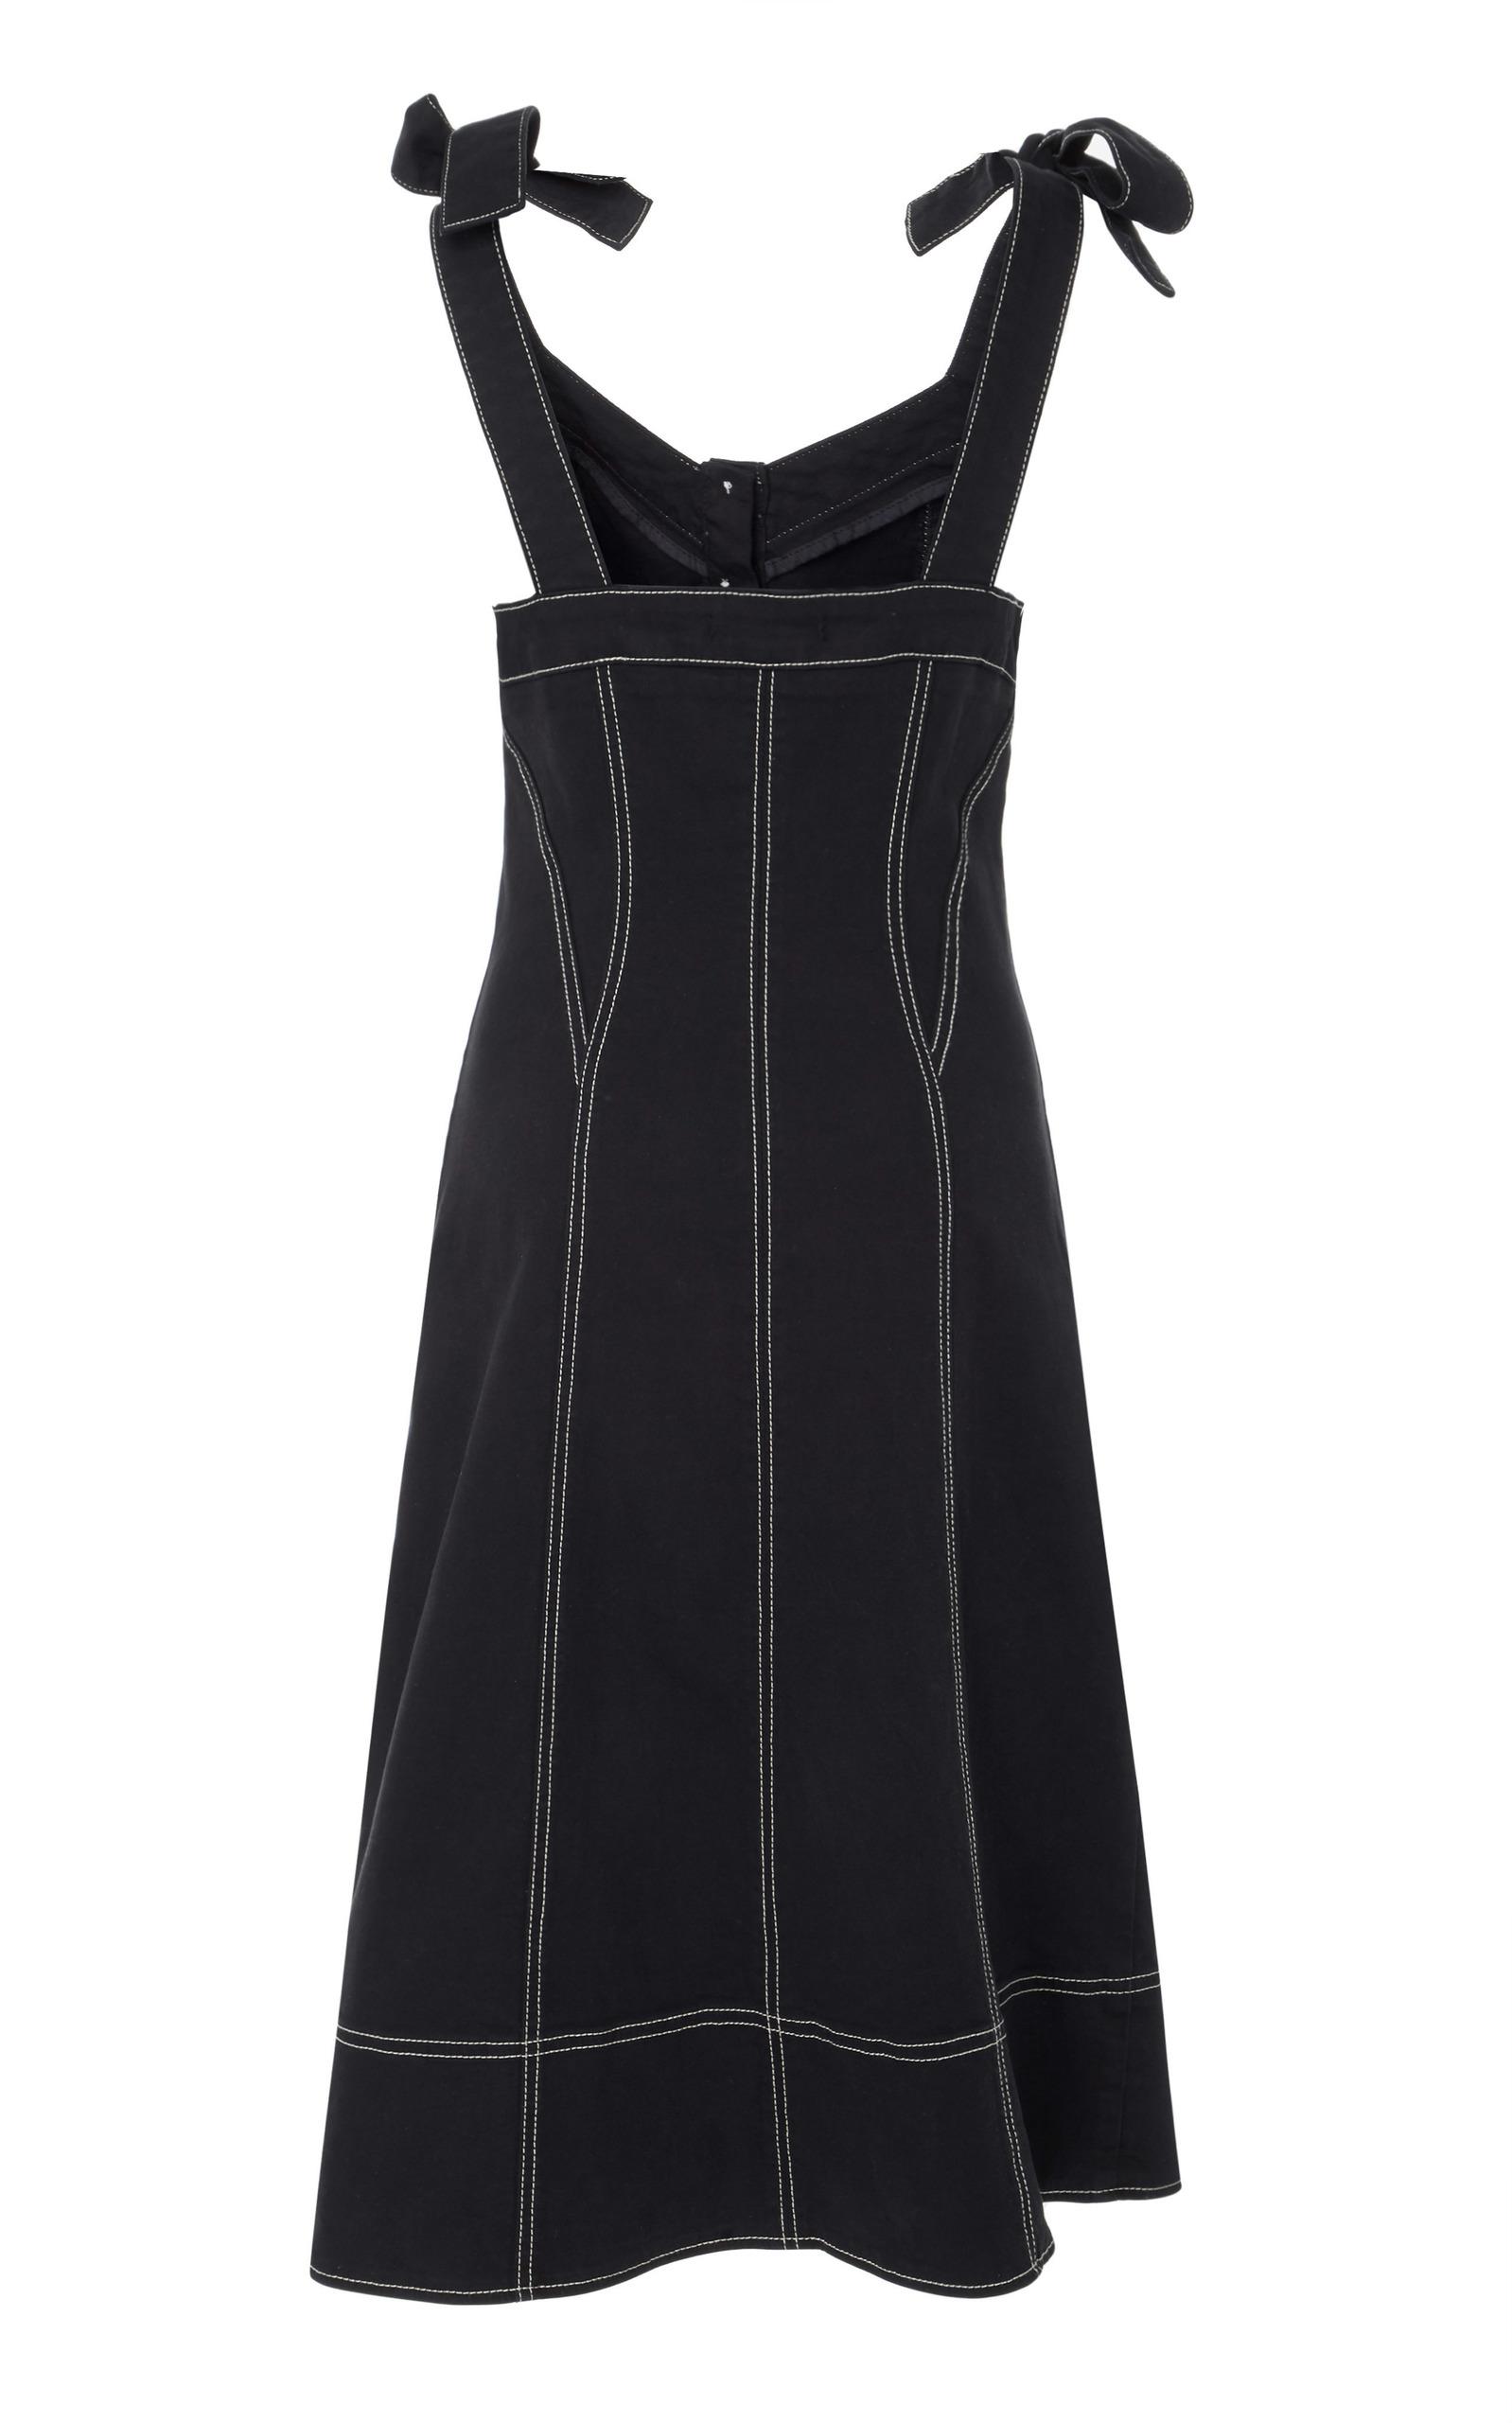 7547c65e5d2 Ulla JohnsonEmory Tailored Shoulder Tie Denim Dress. CLOSE. Loading. Loading